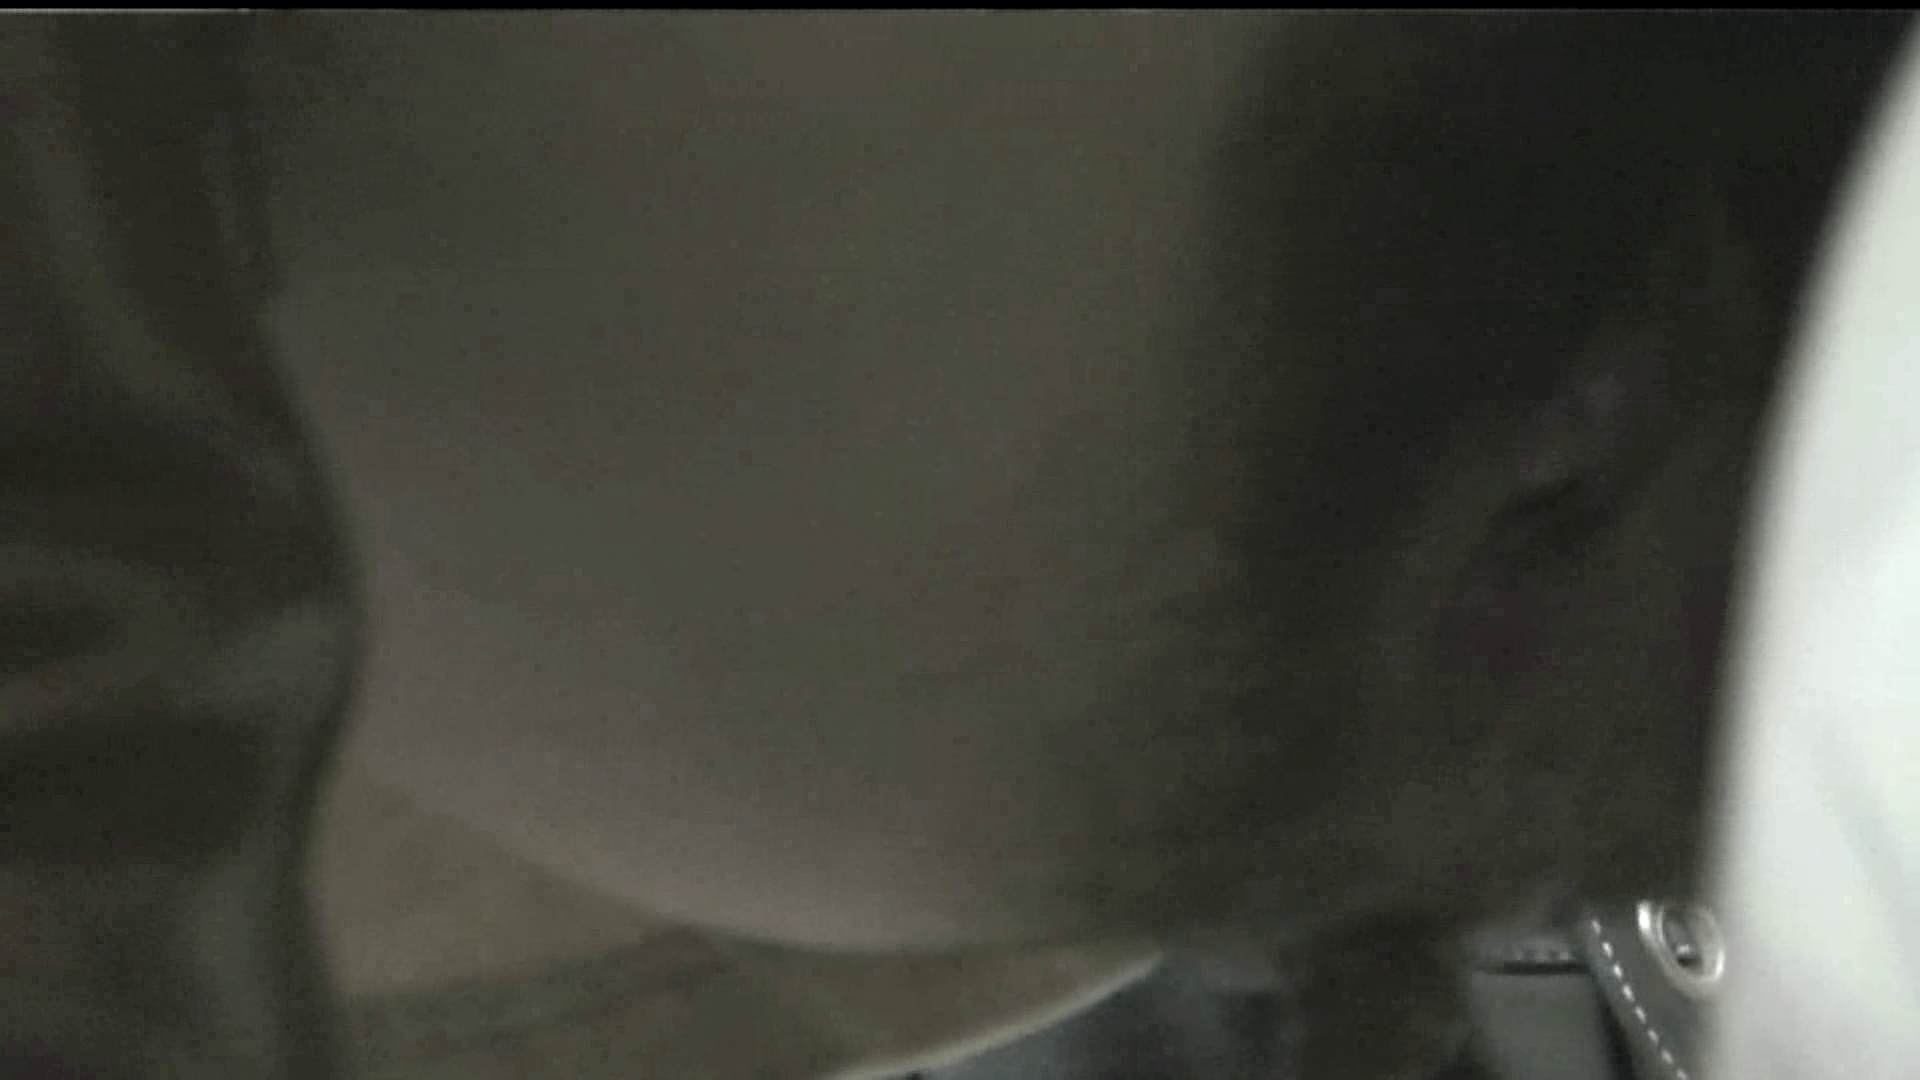 マンコ丸見え女子洗面所Vol.46 洗面所 SEX無修正画像 105連発 38